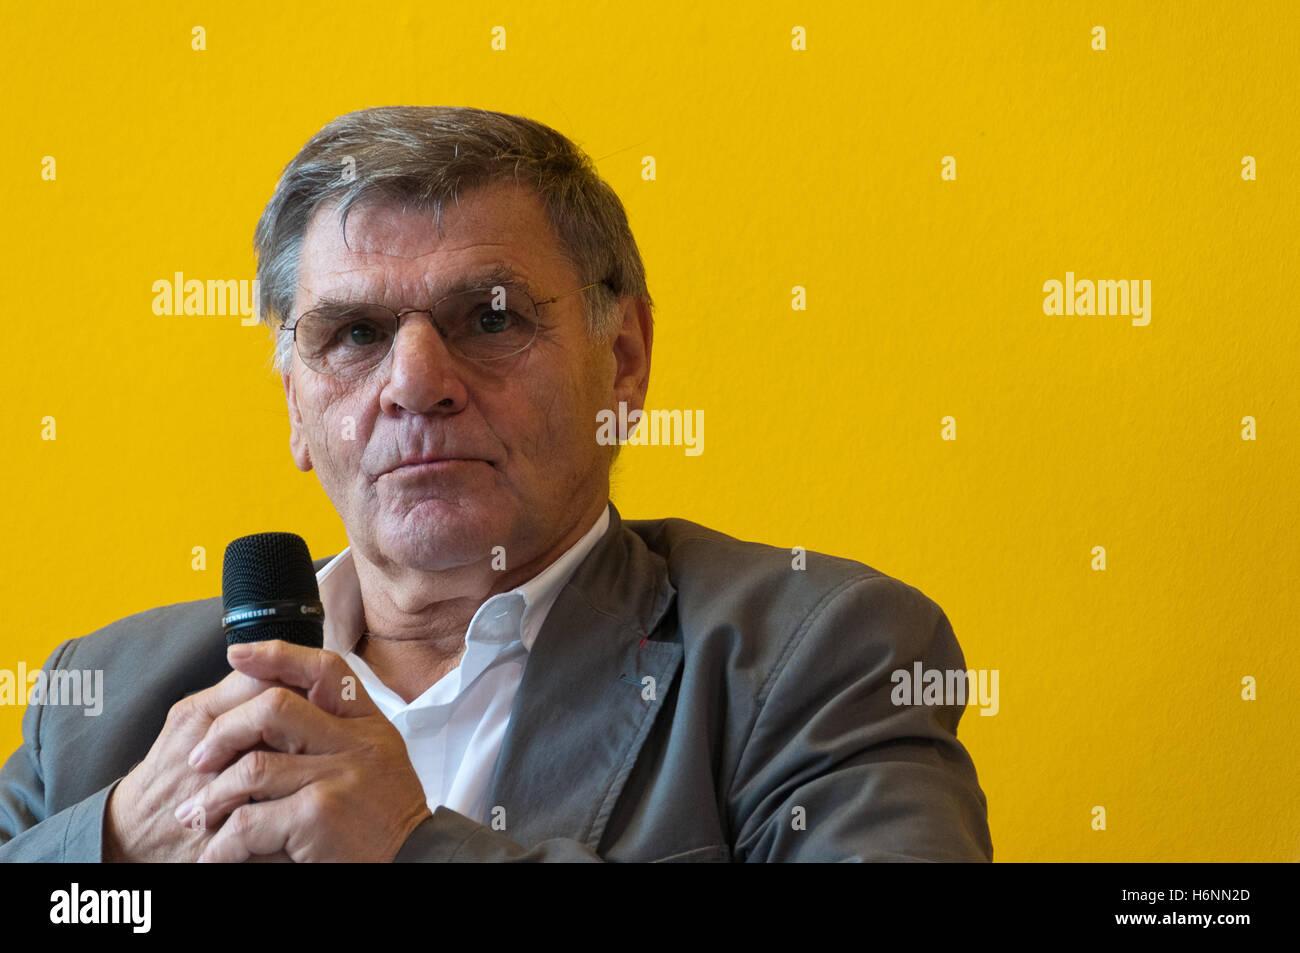 Wolfgang Weber, soccer WM 1966, Frankfurt Bookfair 2016 - Stock Image